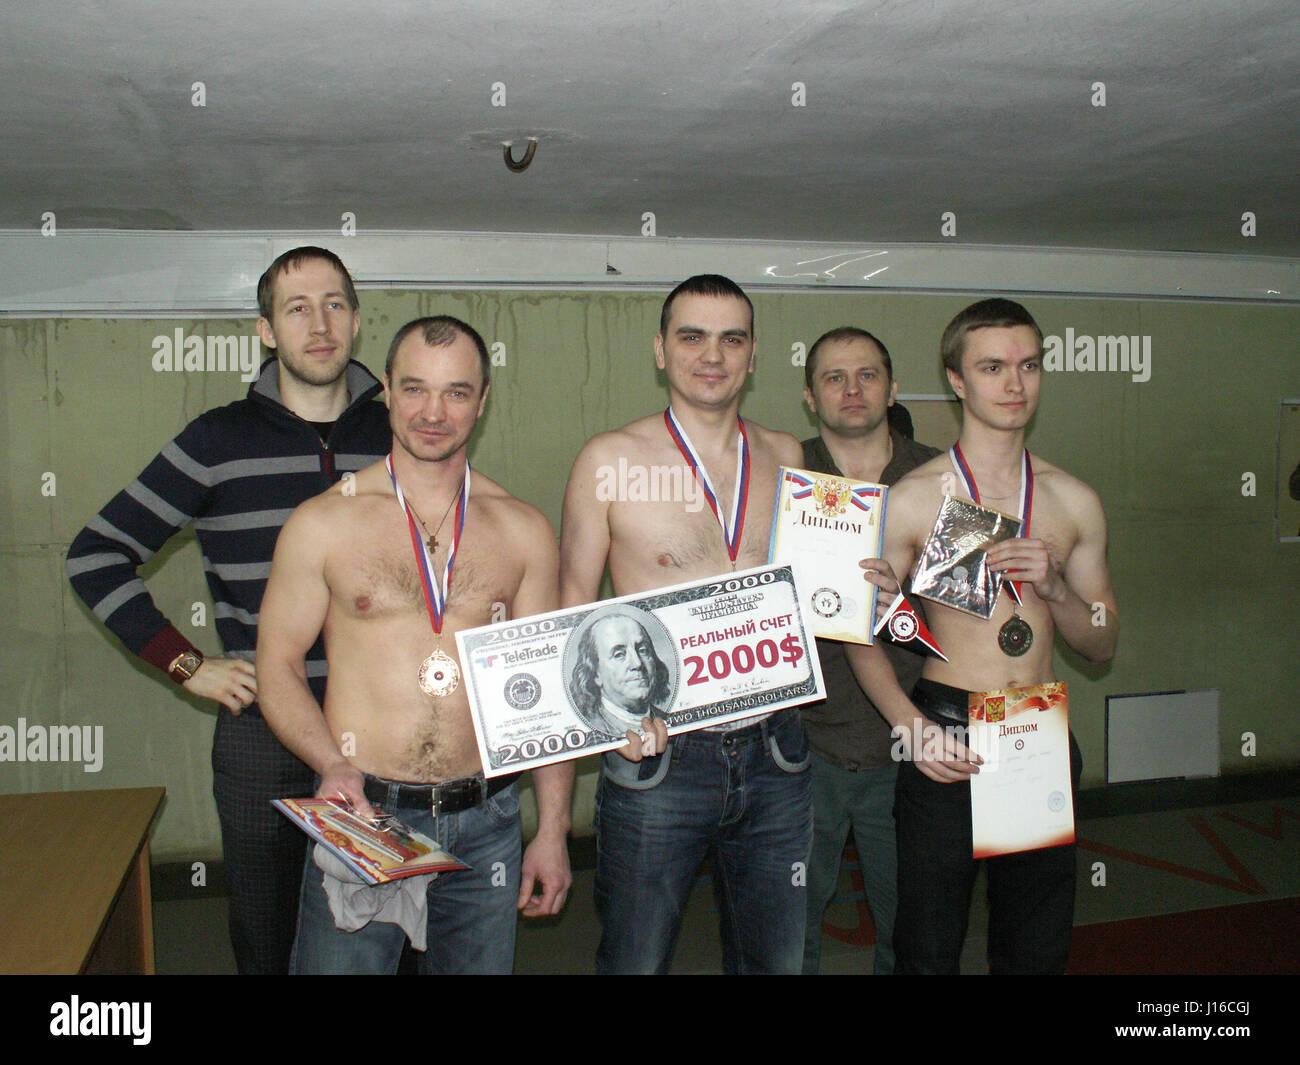 Hardcore Groups 118